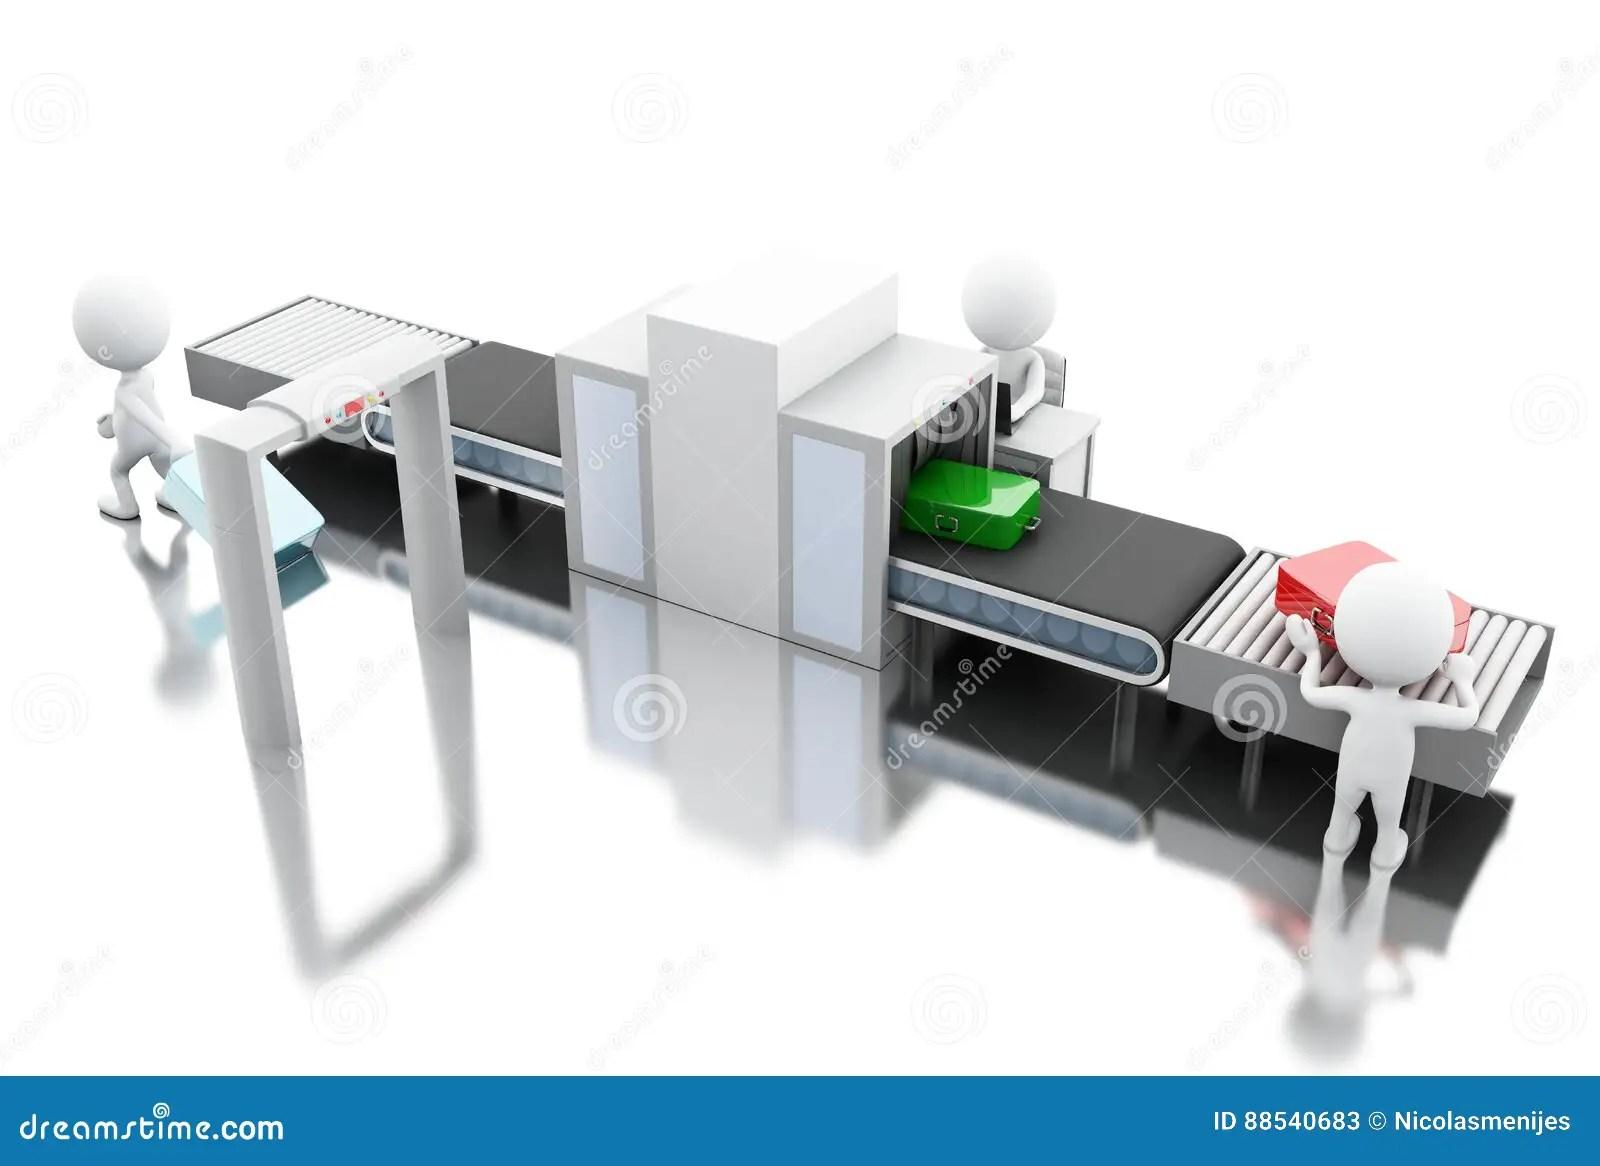 Security Equipment Airport